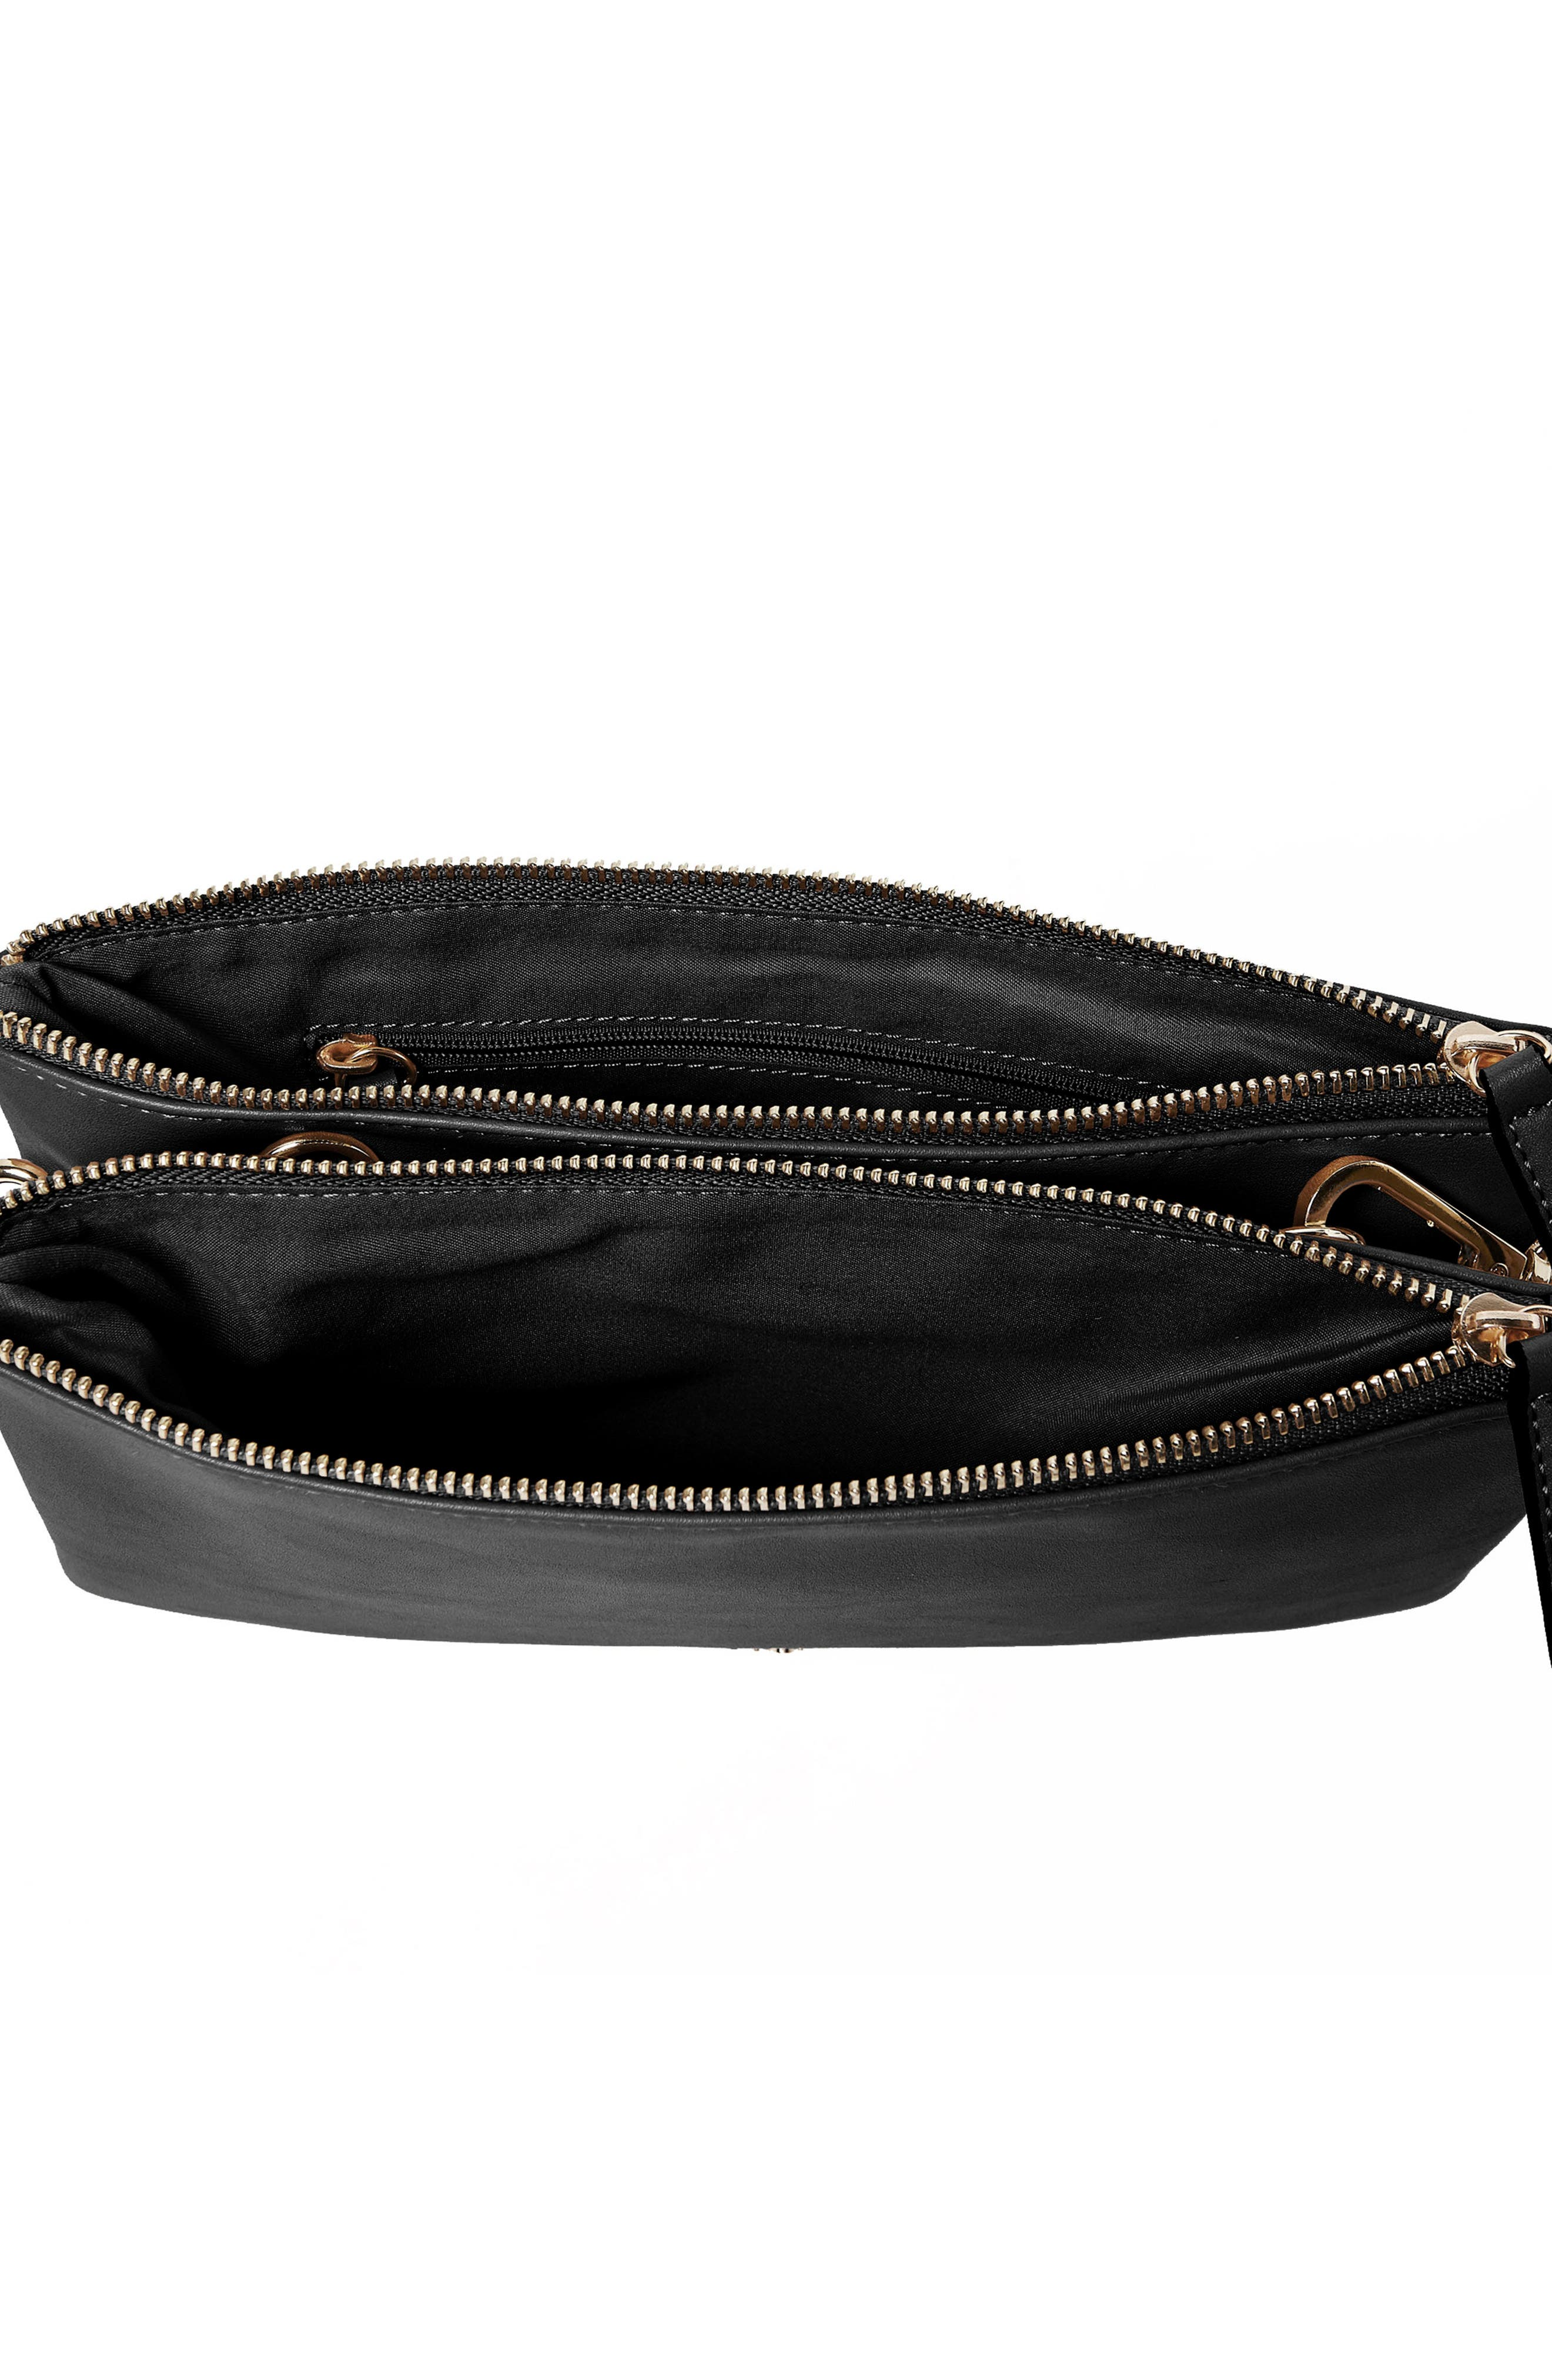 The Enchanted Vegan Leather Crossbody Bag,                             Alternate thumbnail 3, color,                             Black